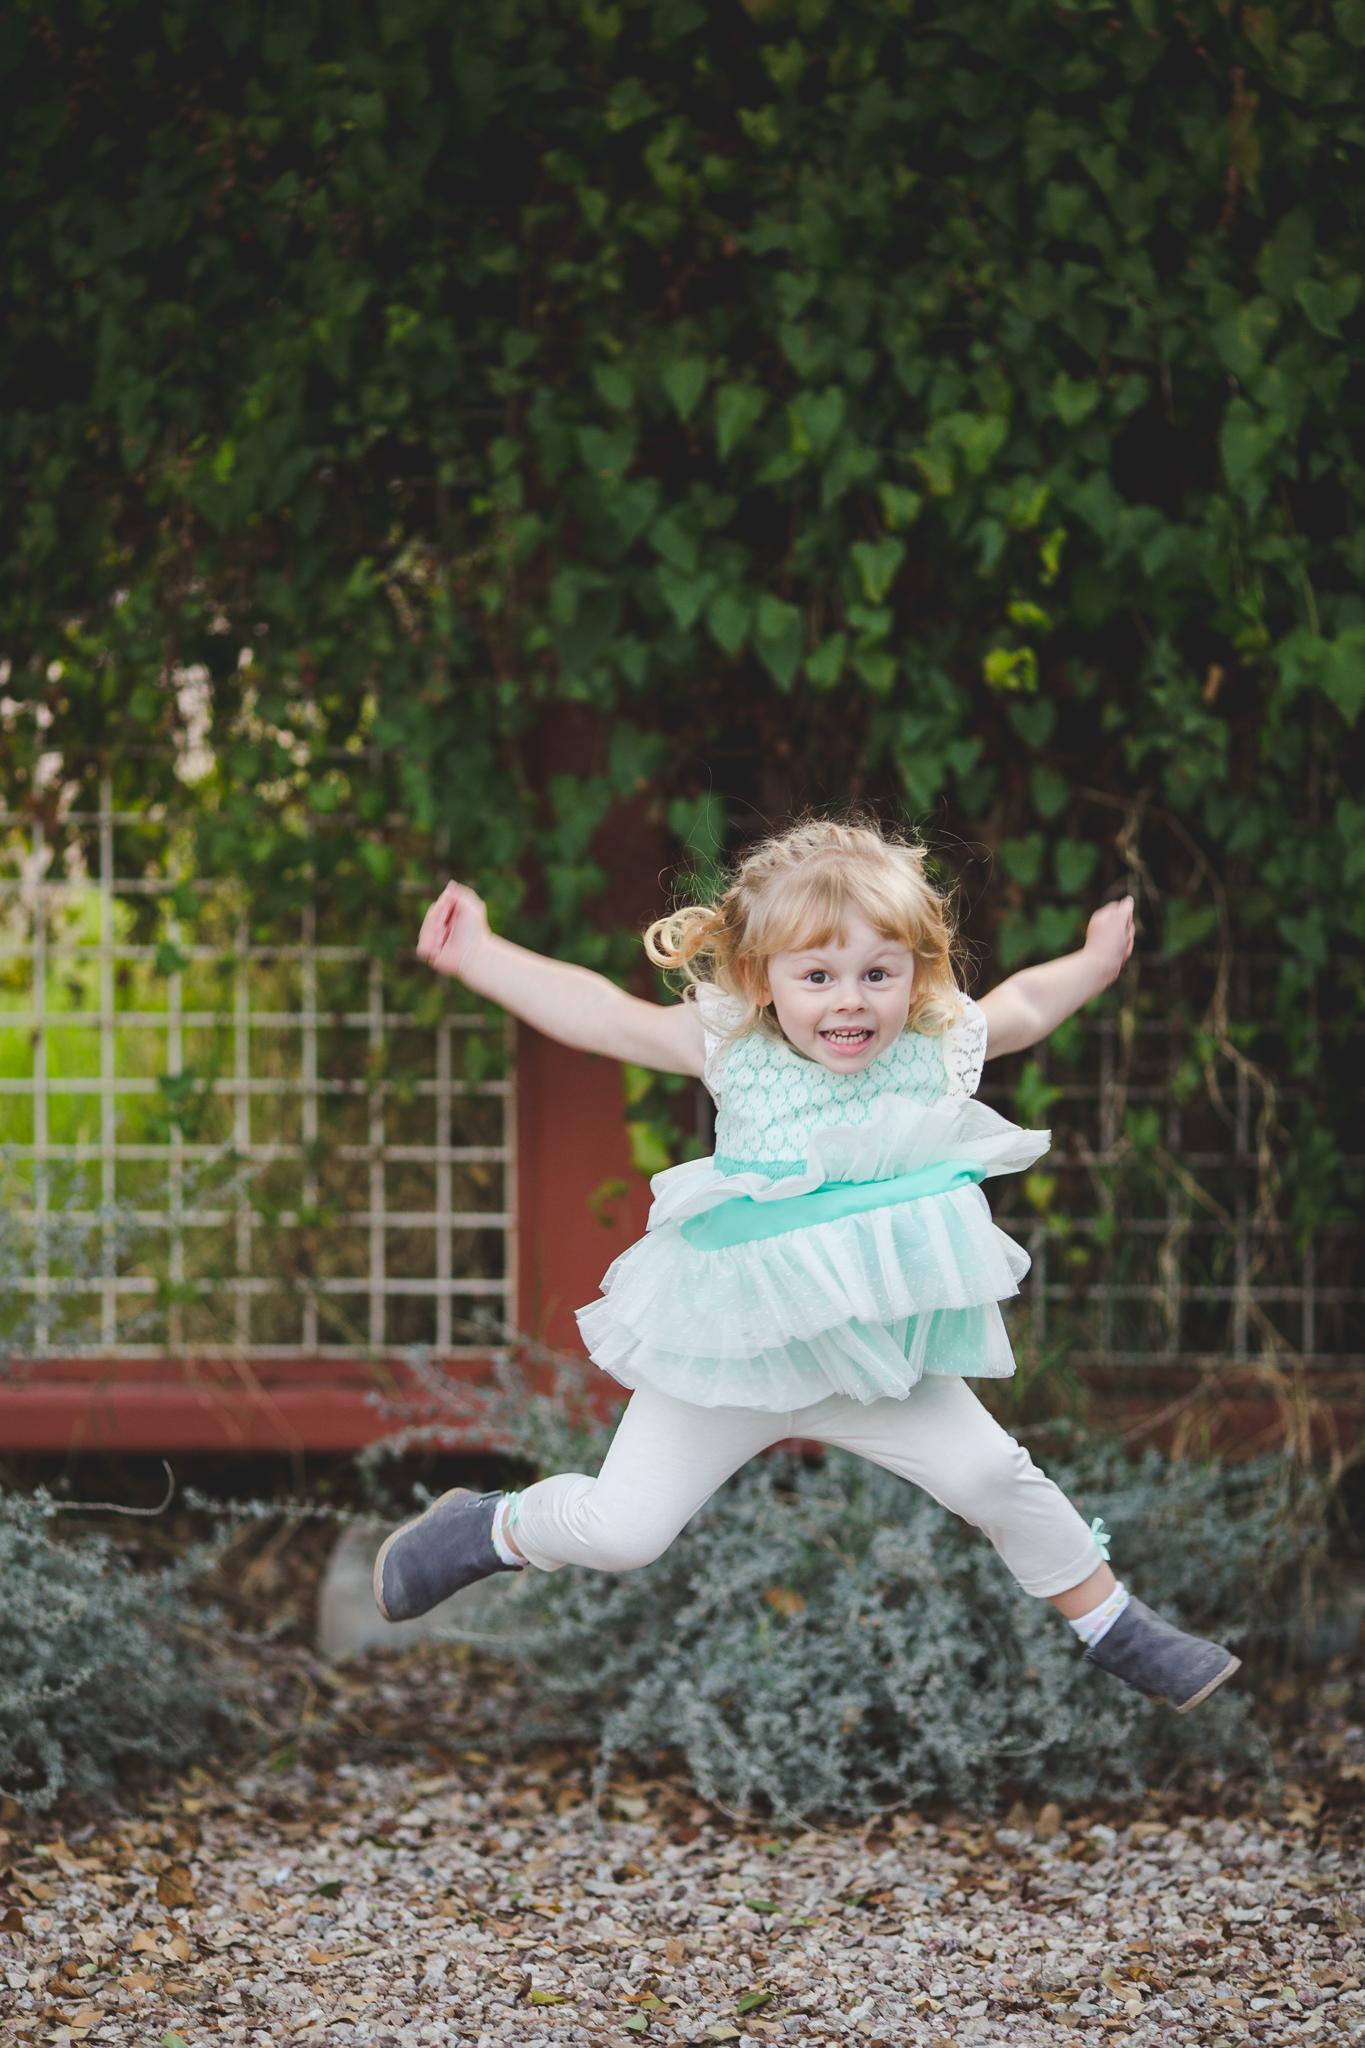 vote family daughter jumping around having fun